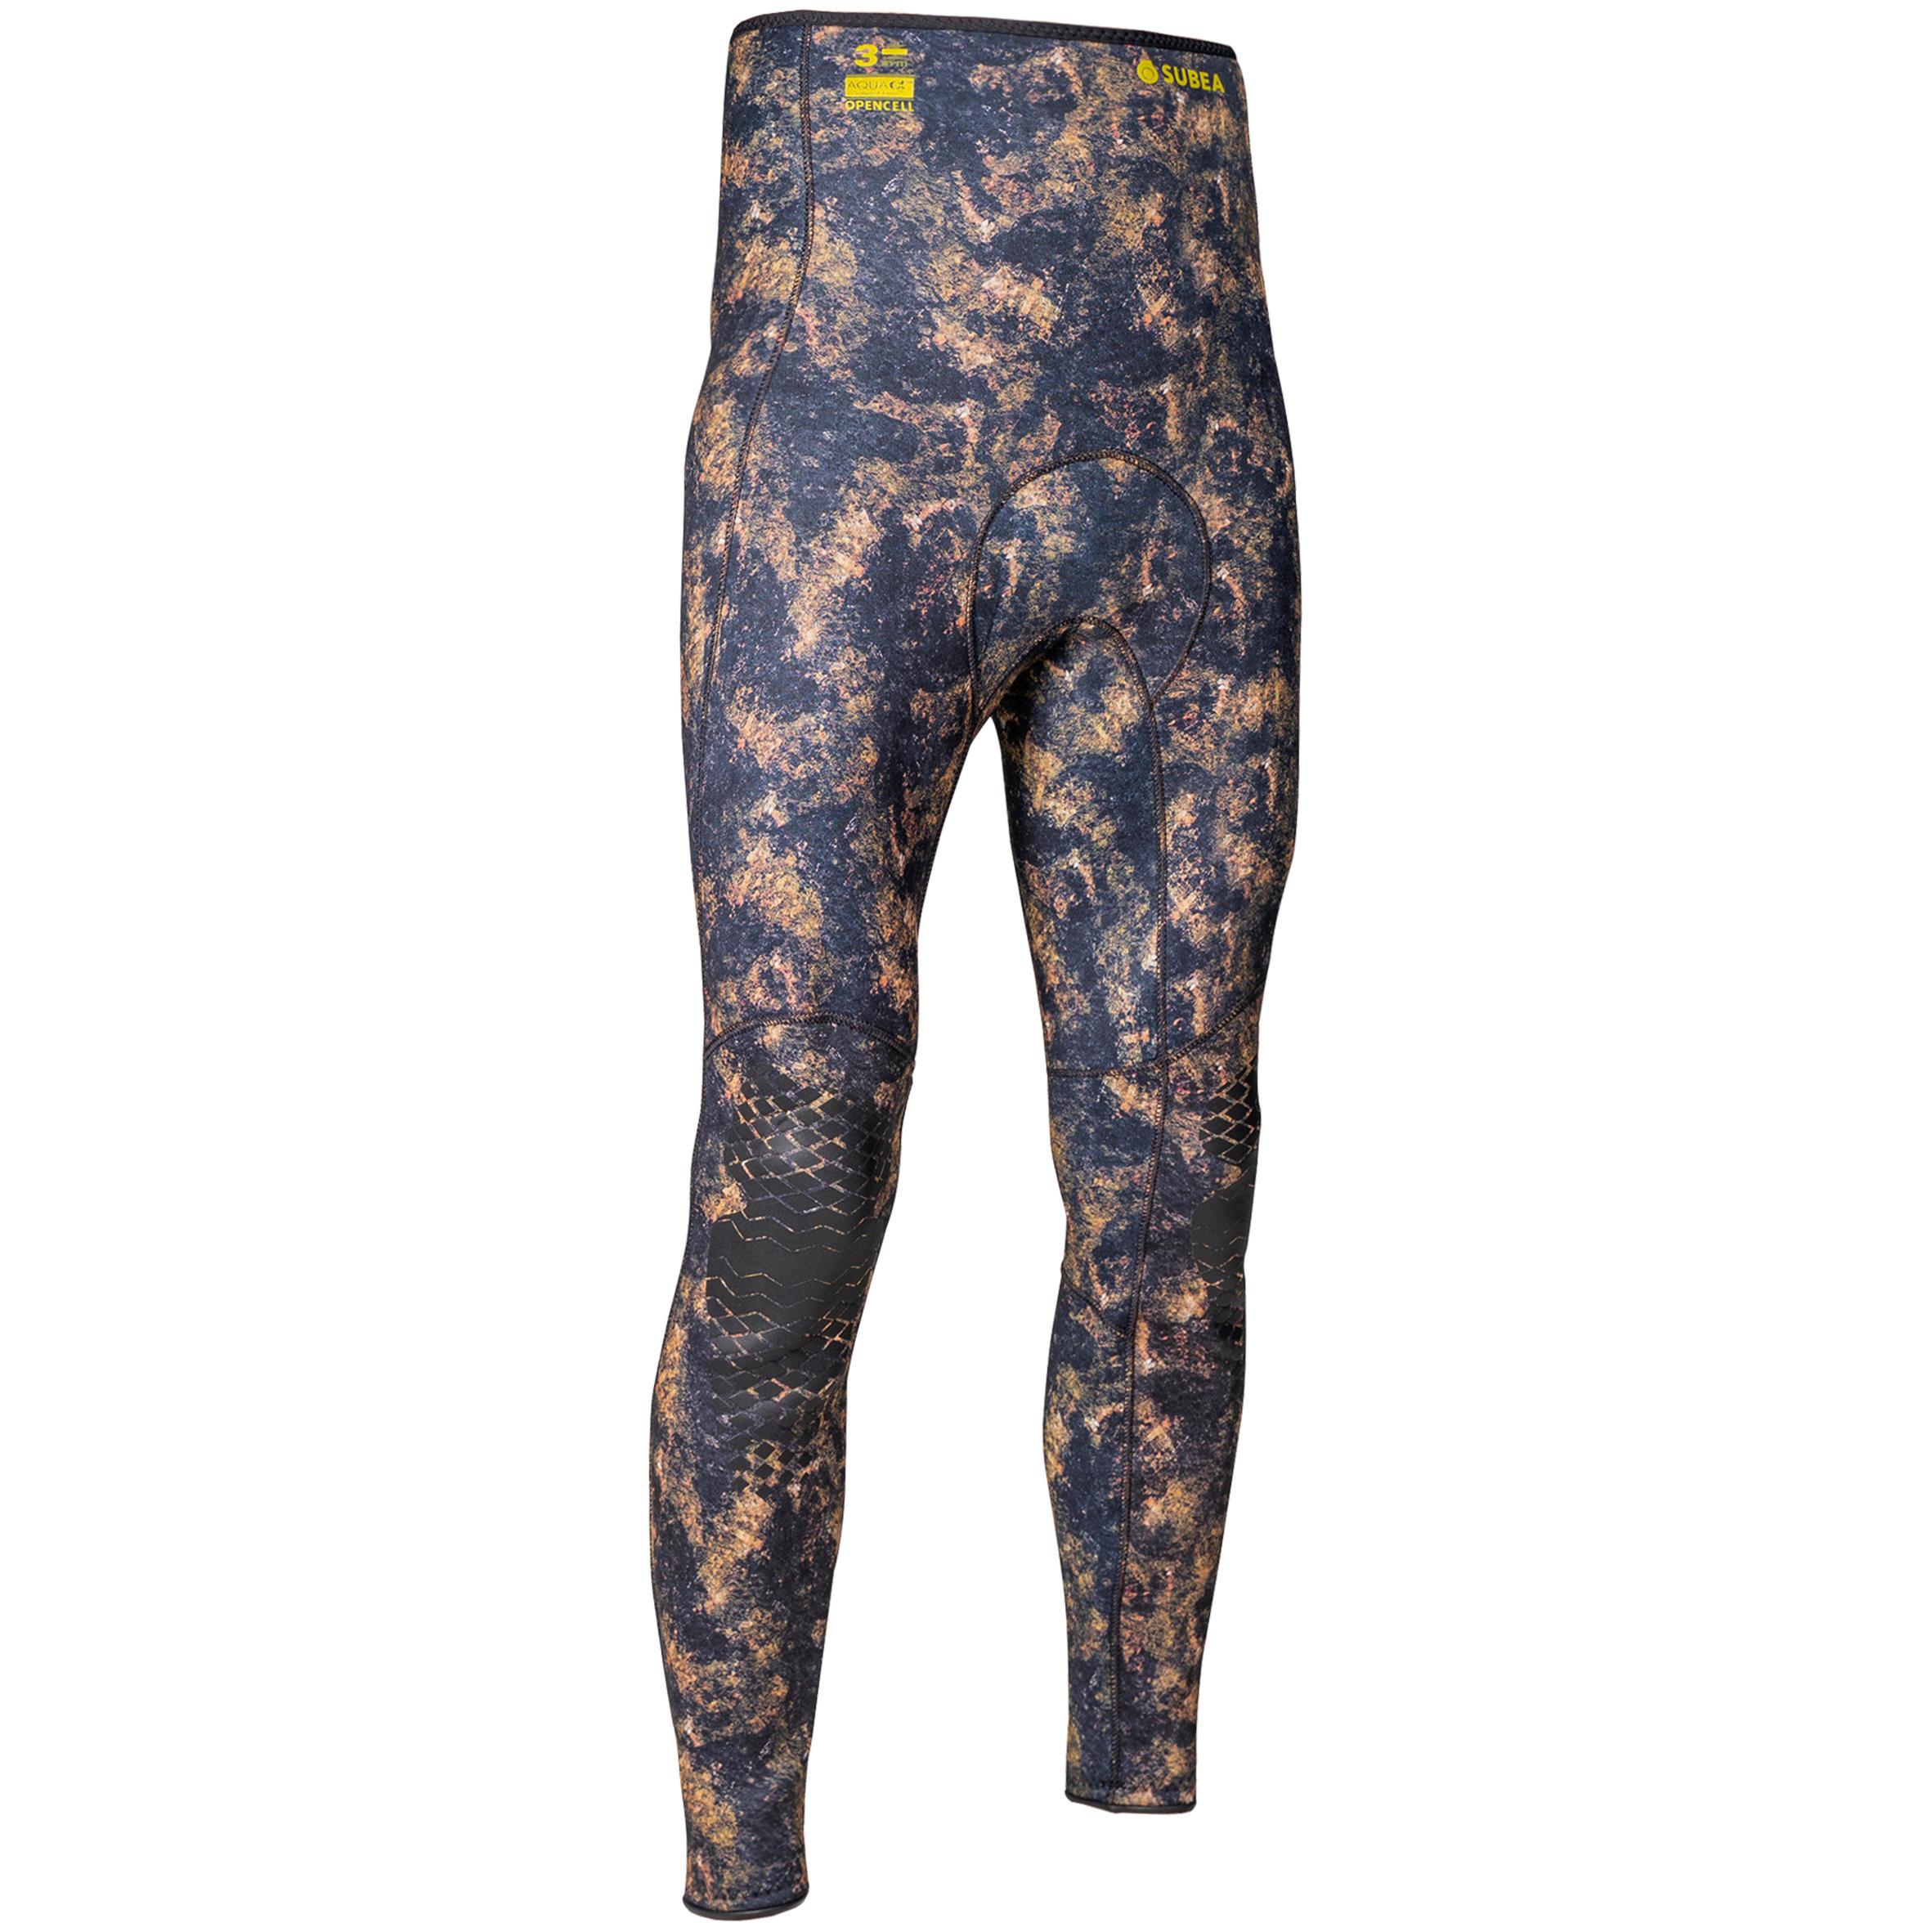 Neoprenhose Tauchen 3mm Camouflage | Bekleidung > Bademode > Badeshorts | Subea